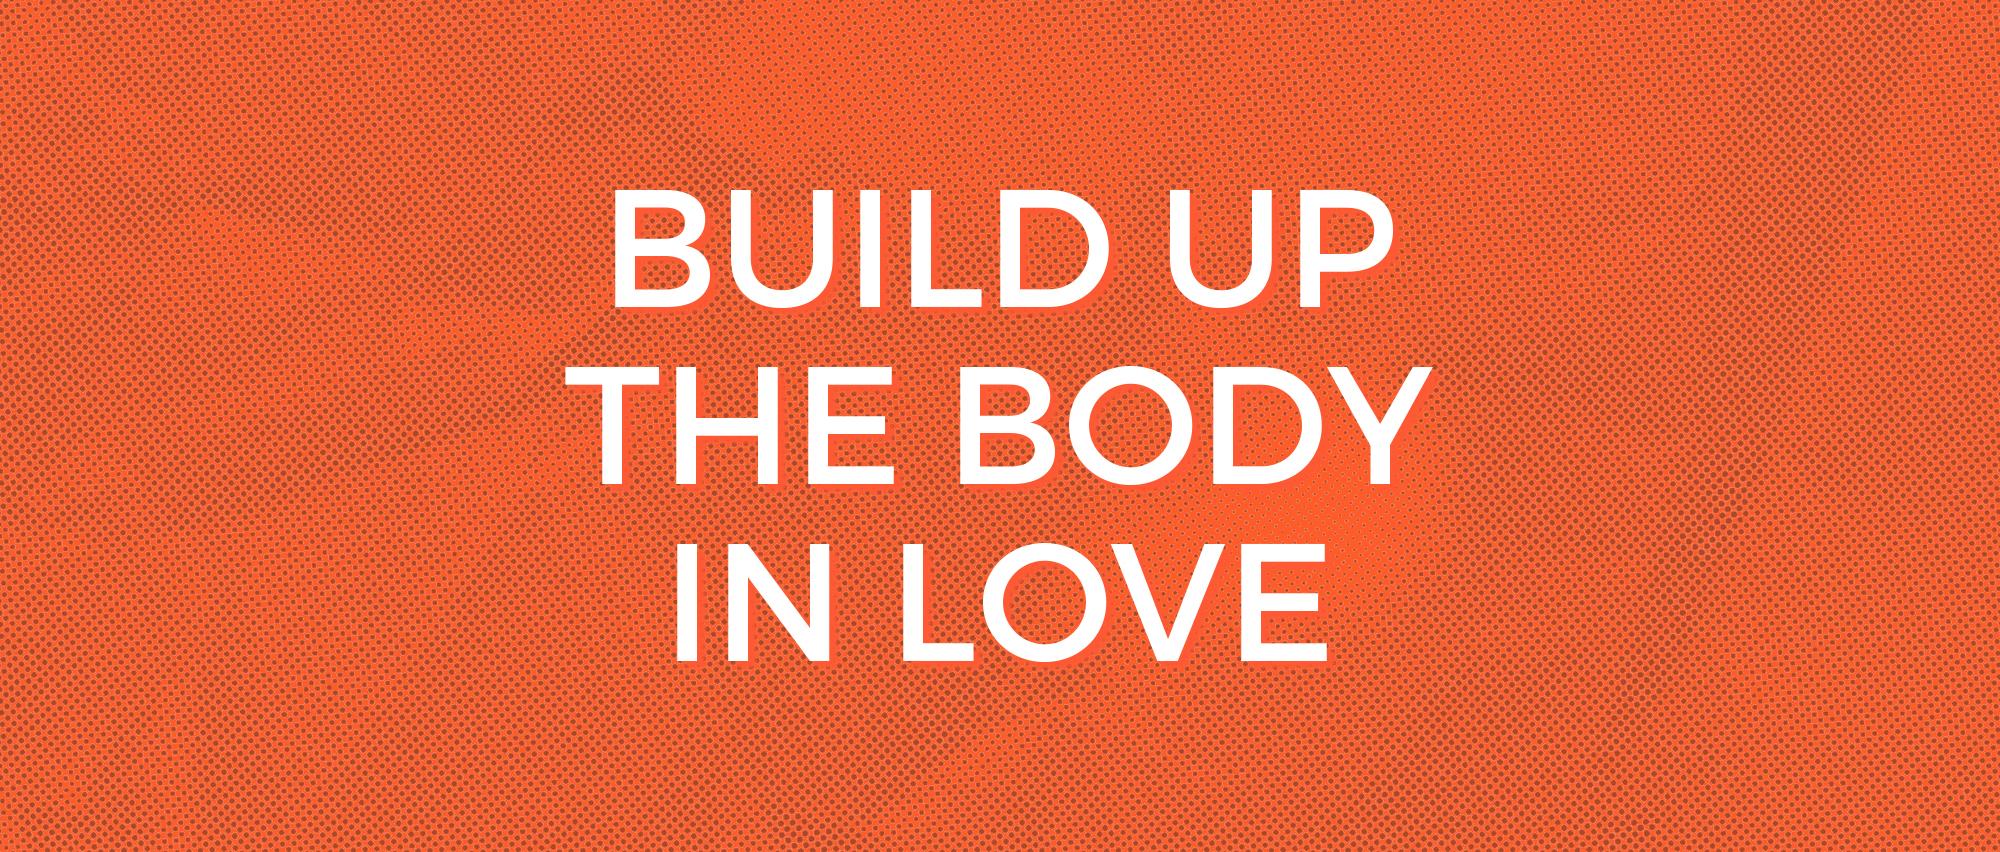 build up the body.jpg